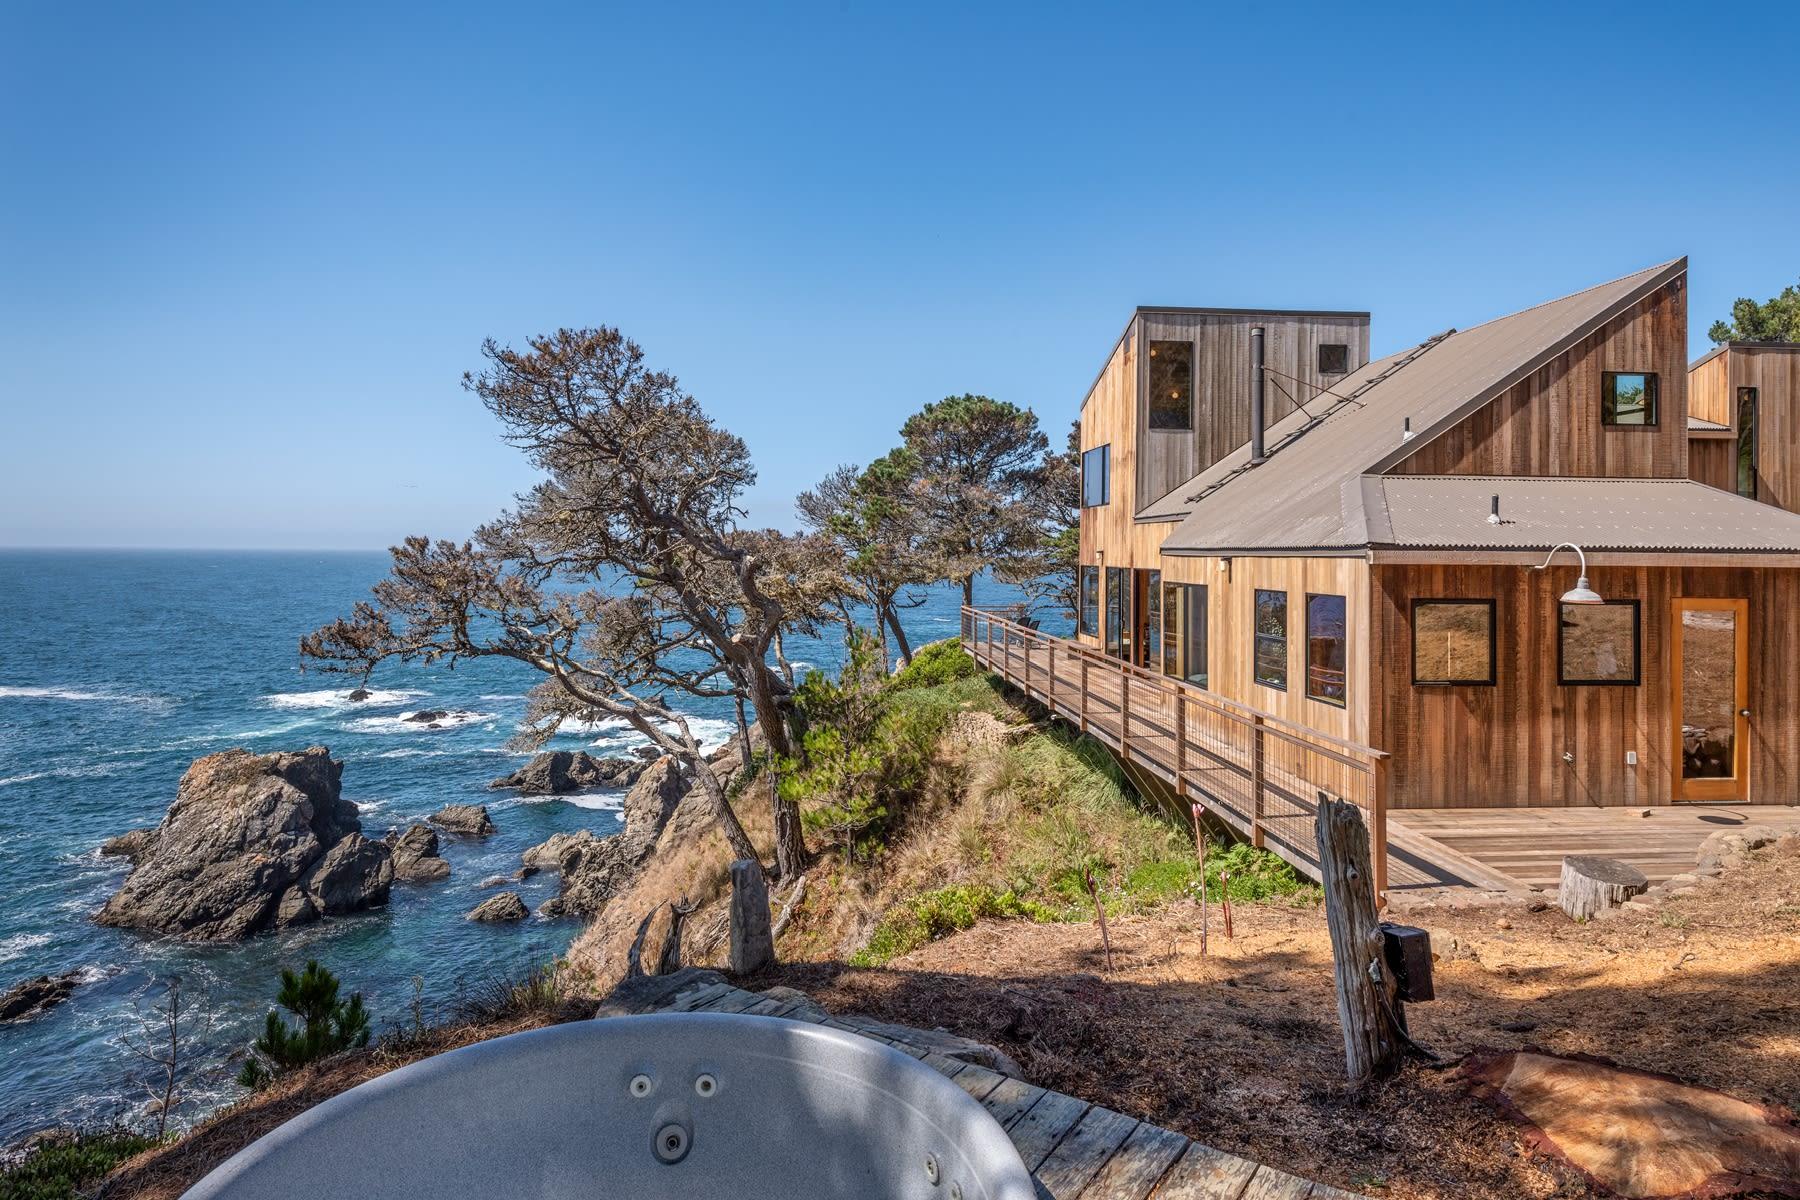 Peek Inside Iconic Sea Ranch Property